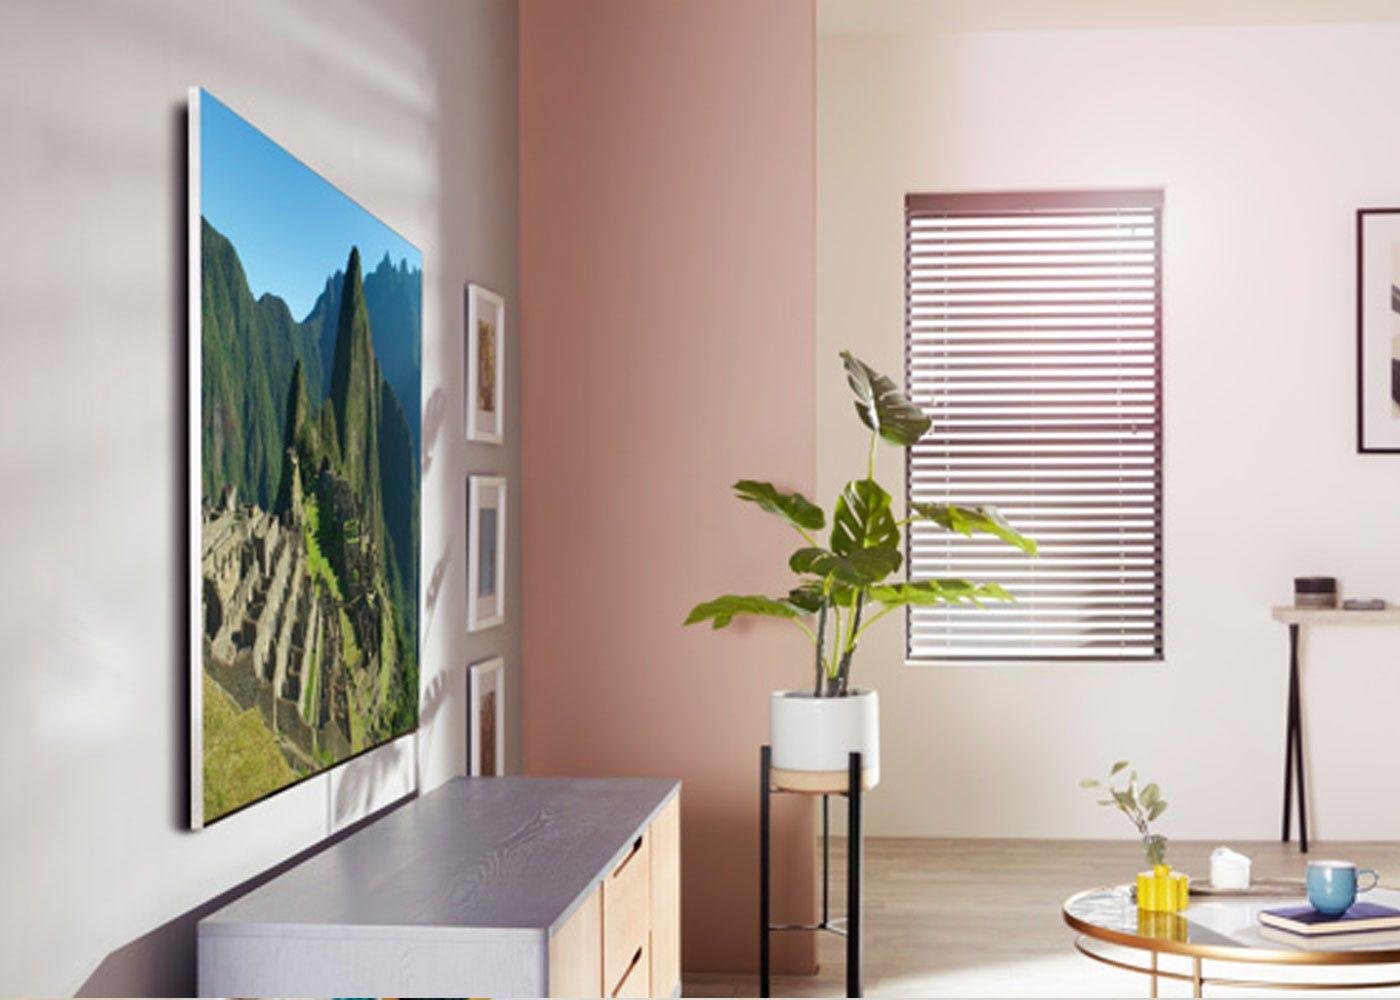 As shown: Samsung 2020 85 Q950TS Flagship QLED 8K HDR 4000 Smart TV - Wall mounted.